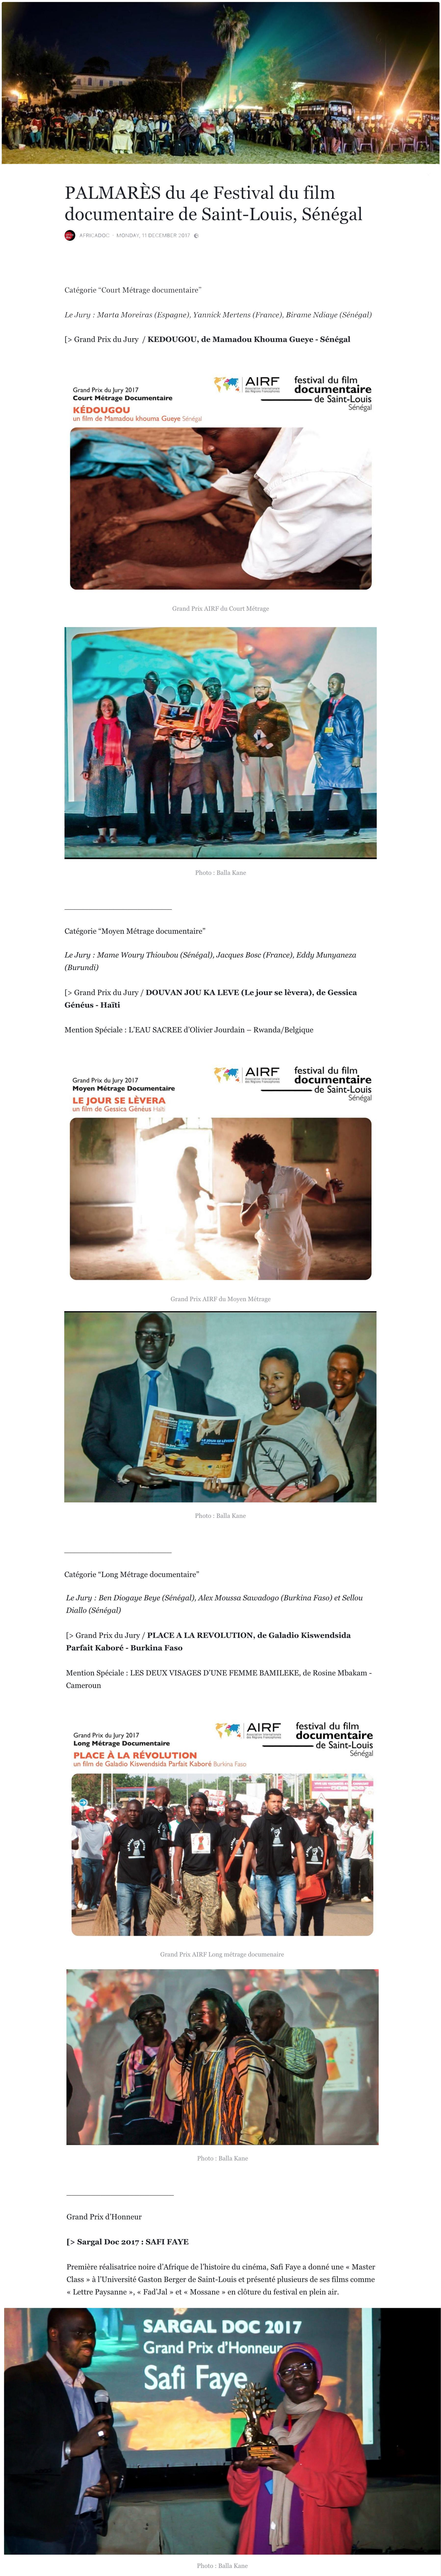 AfricaDOC_2017_01_lowres